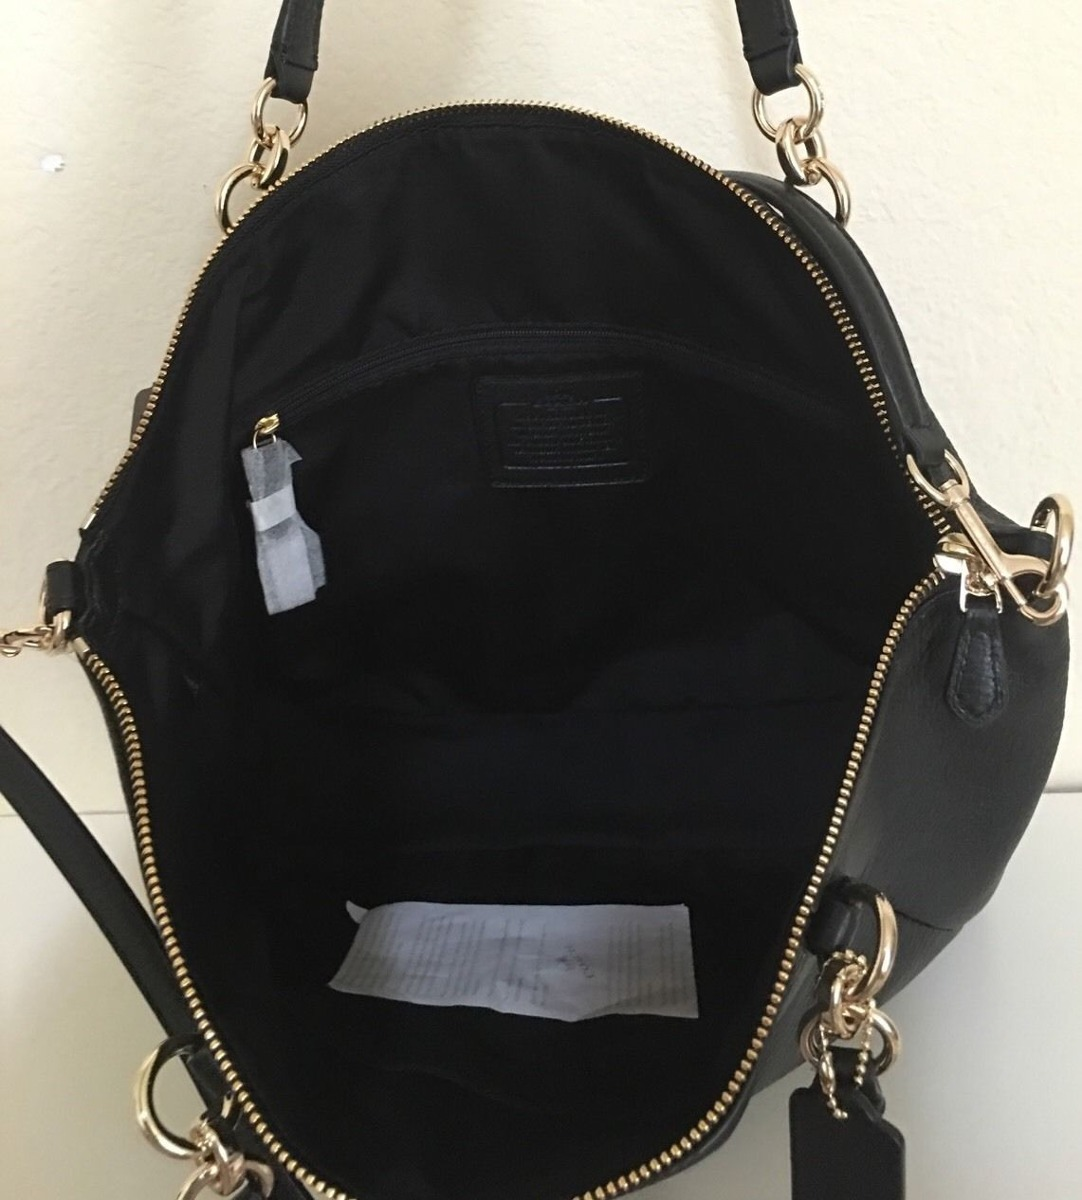 421834518 Carregando zoom... bolsa coach pebble leather mini kelsey satchel crossbody